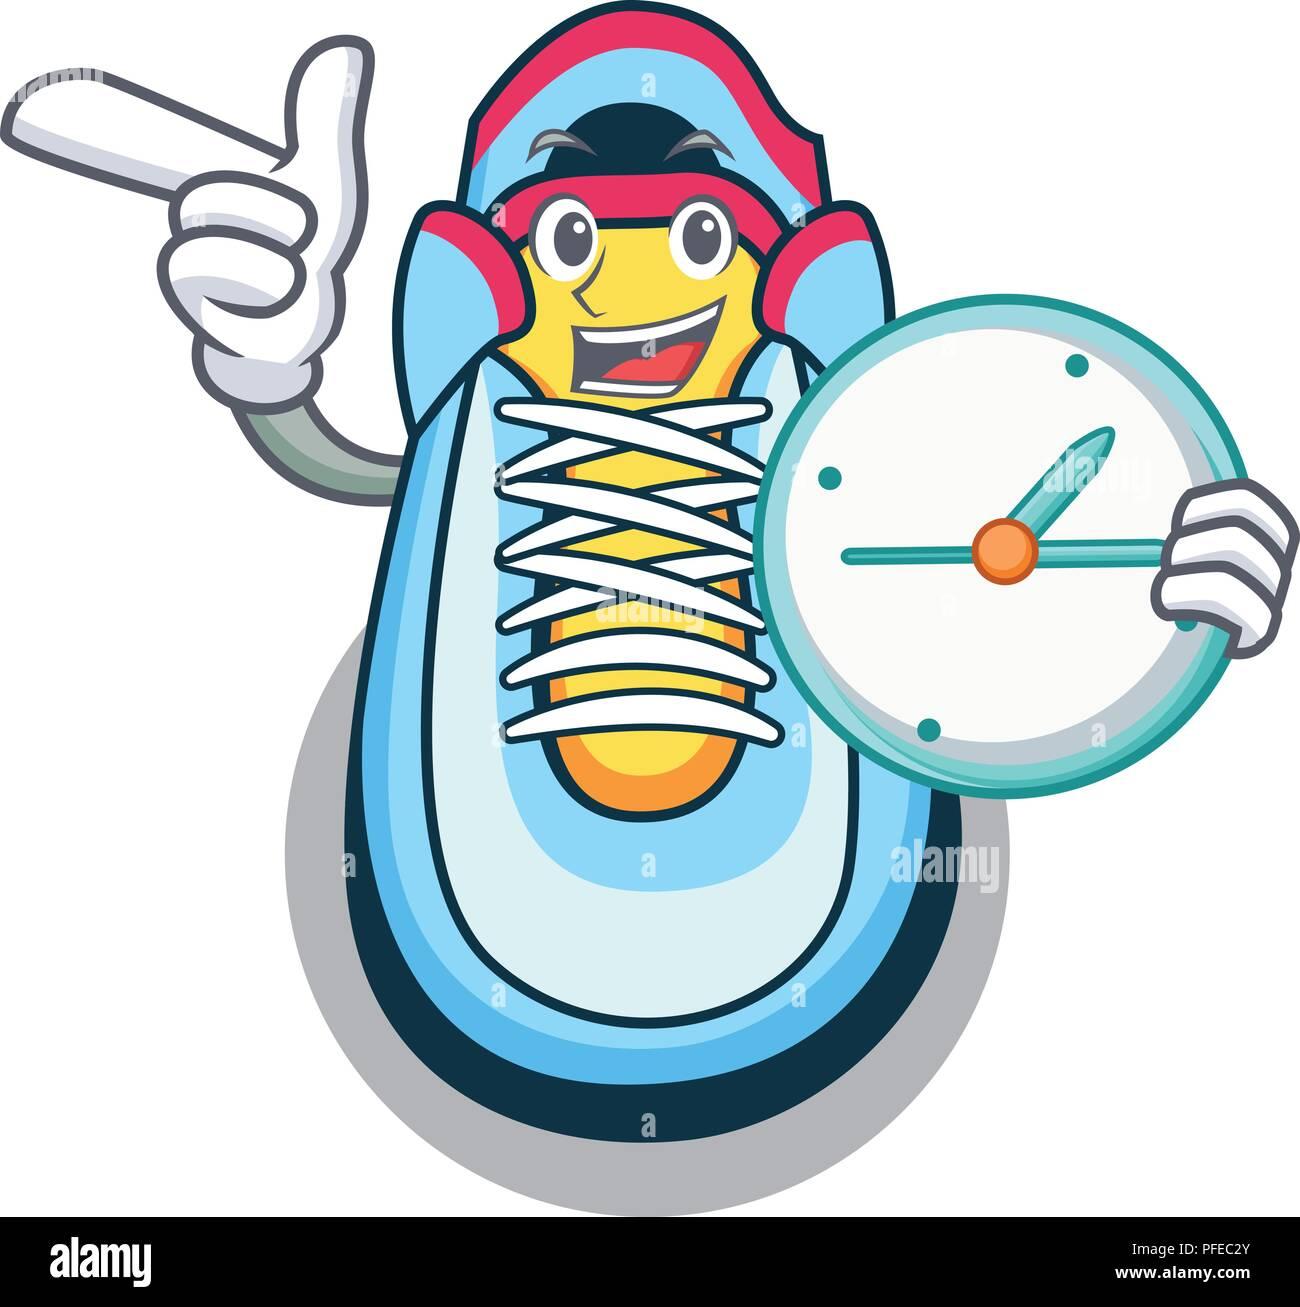 Cartoon Illustration Running Alarm Clock Stock Photos Cartoon